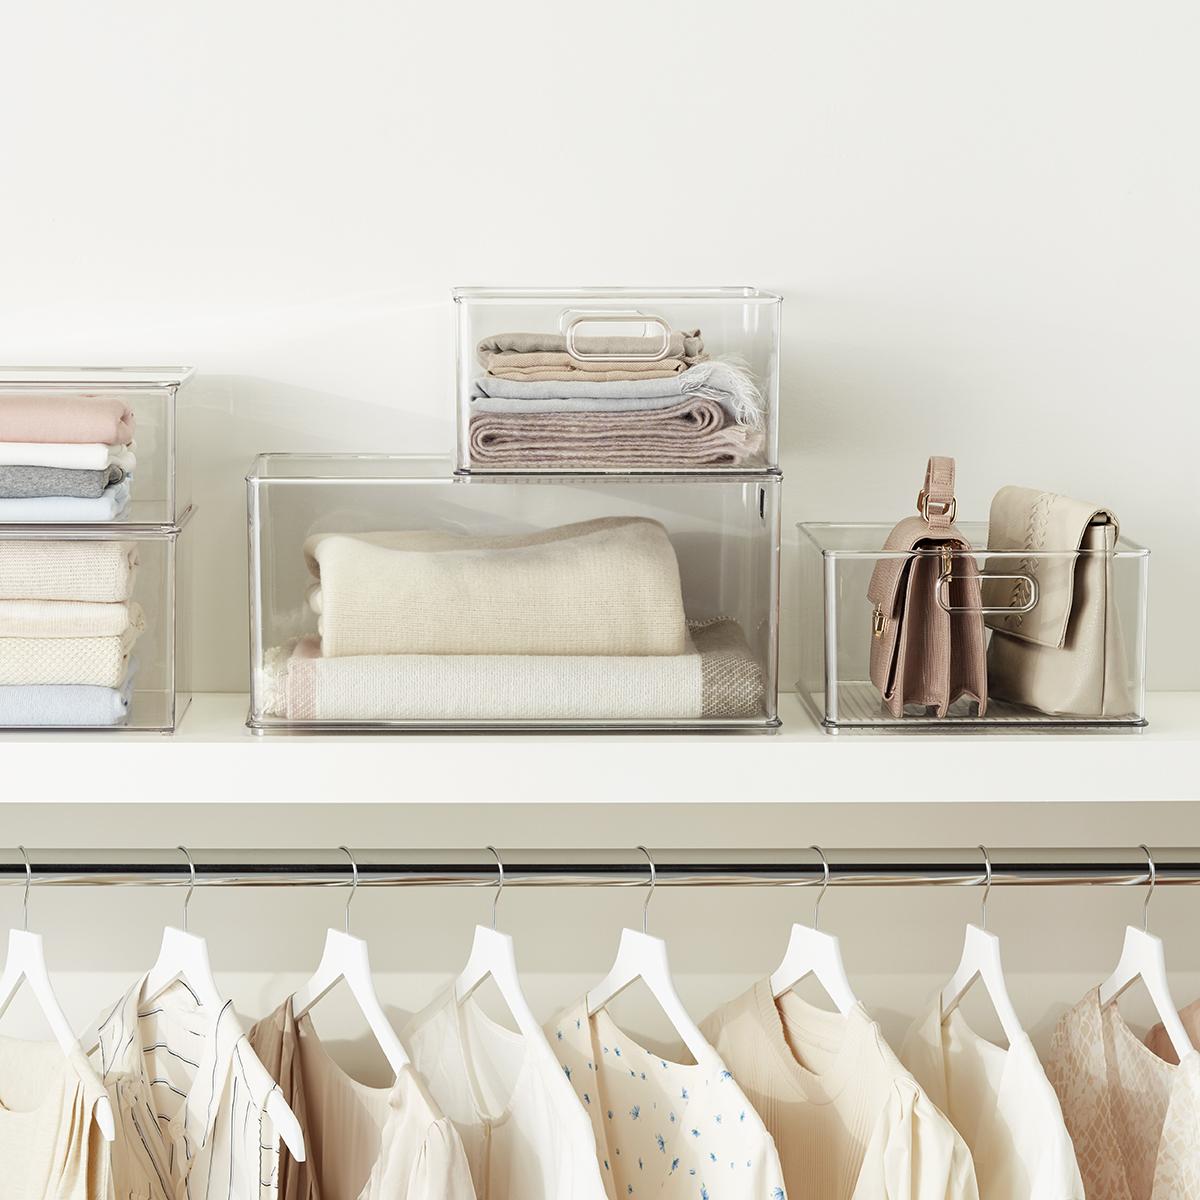 iDesign Clear Stackable Closet Bins